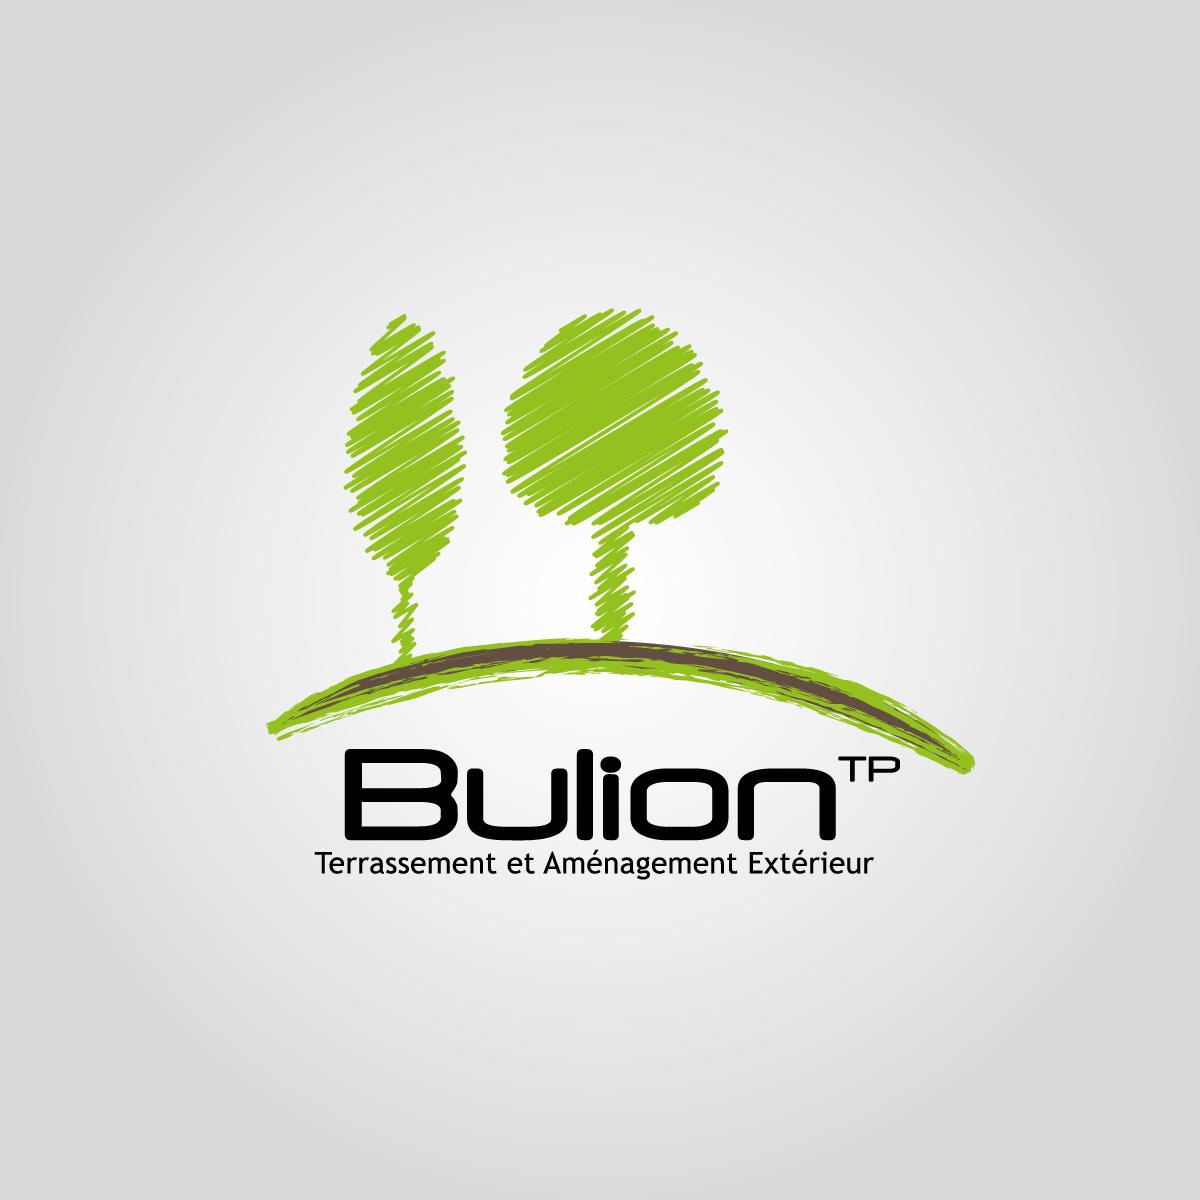 bulion-tp-logo